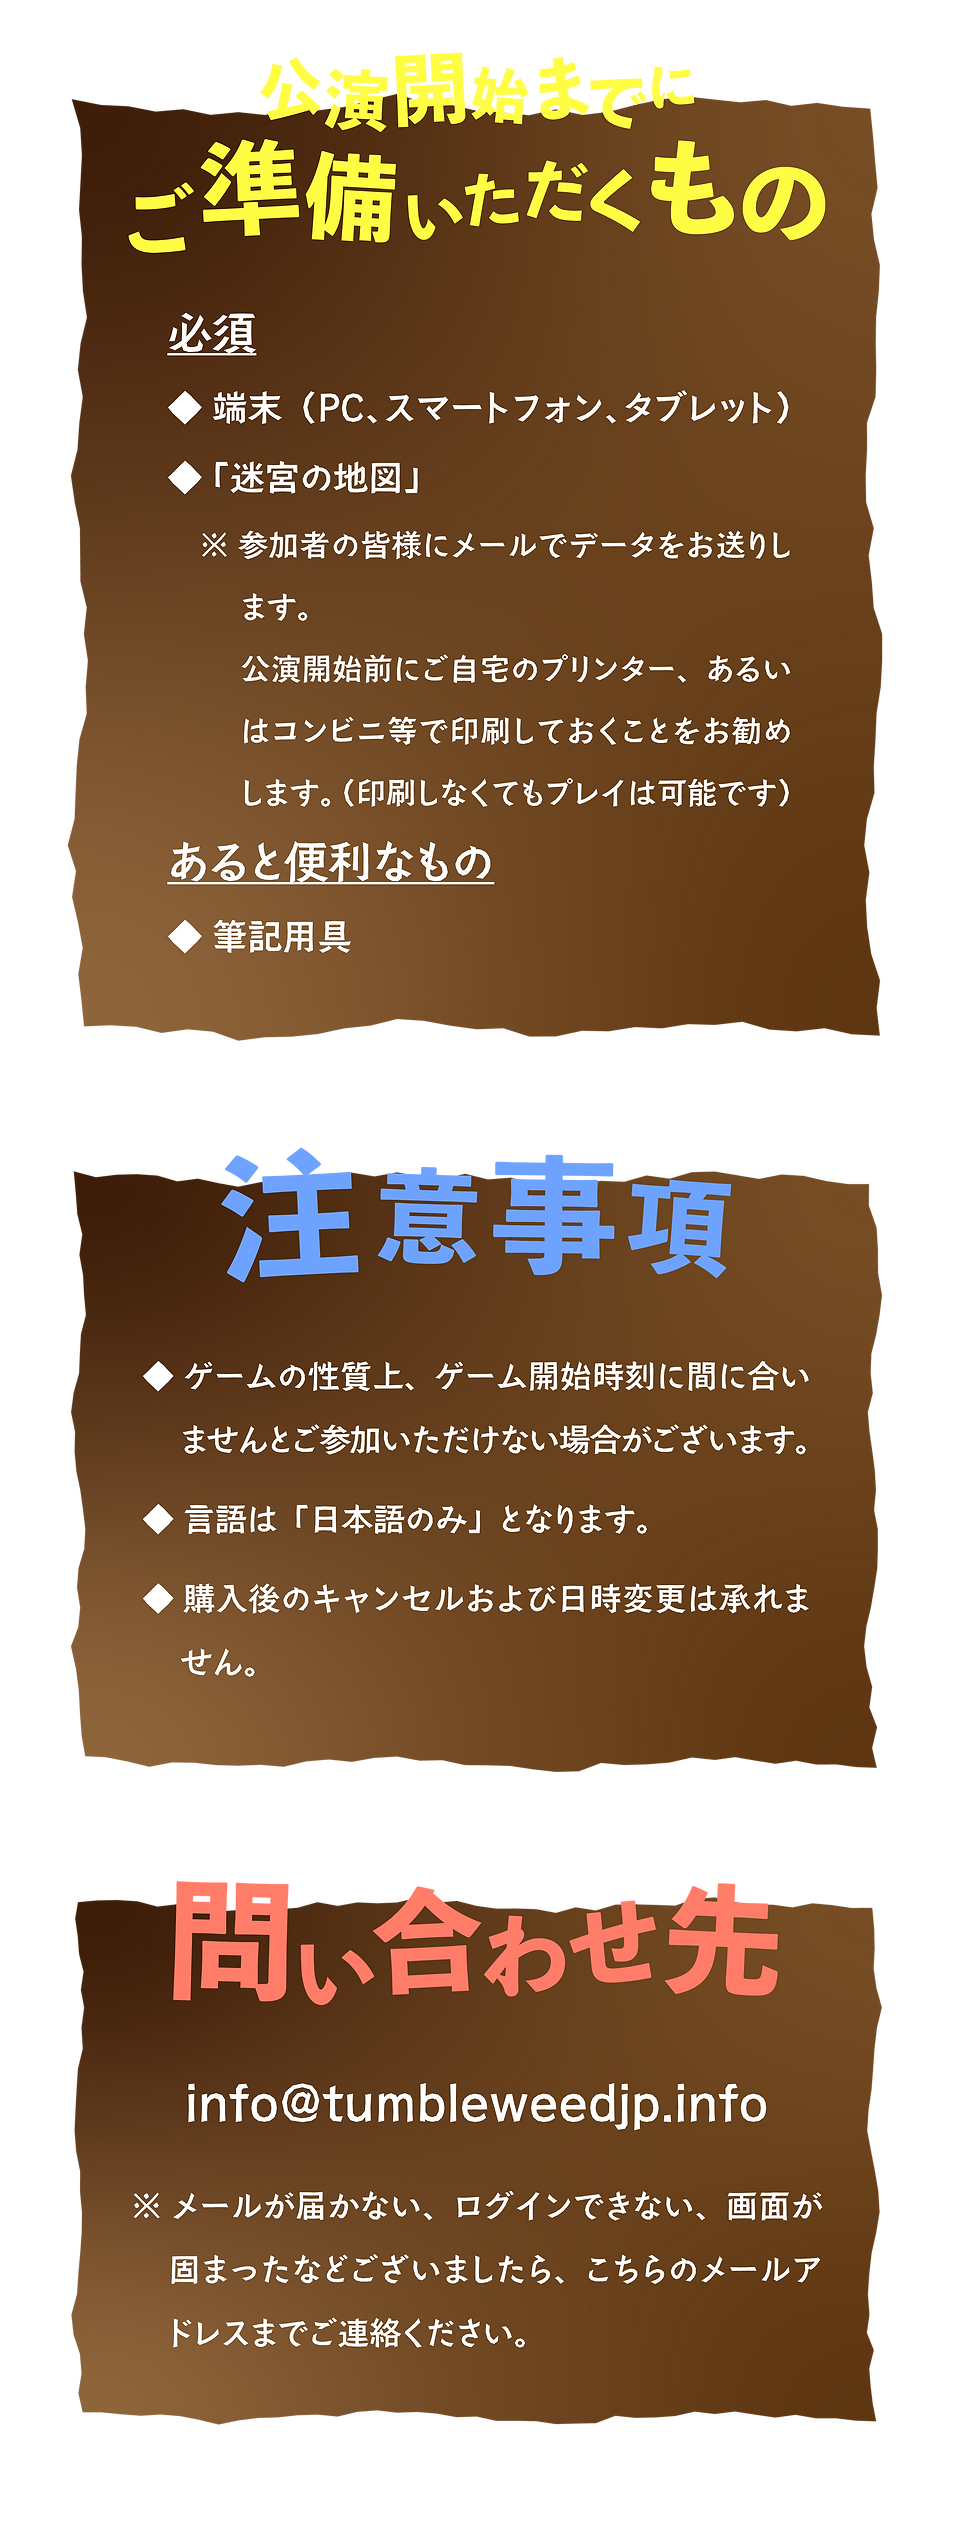 7_SDR_prep_note_inqu.png